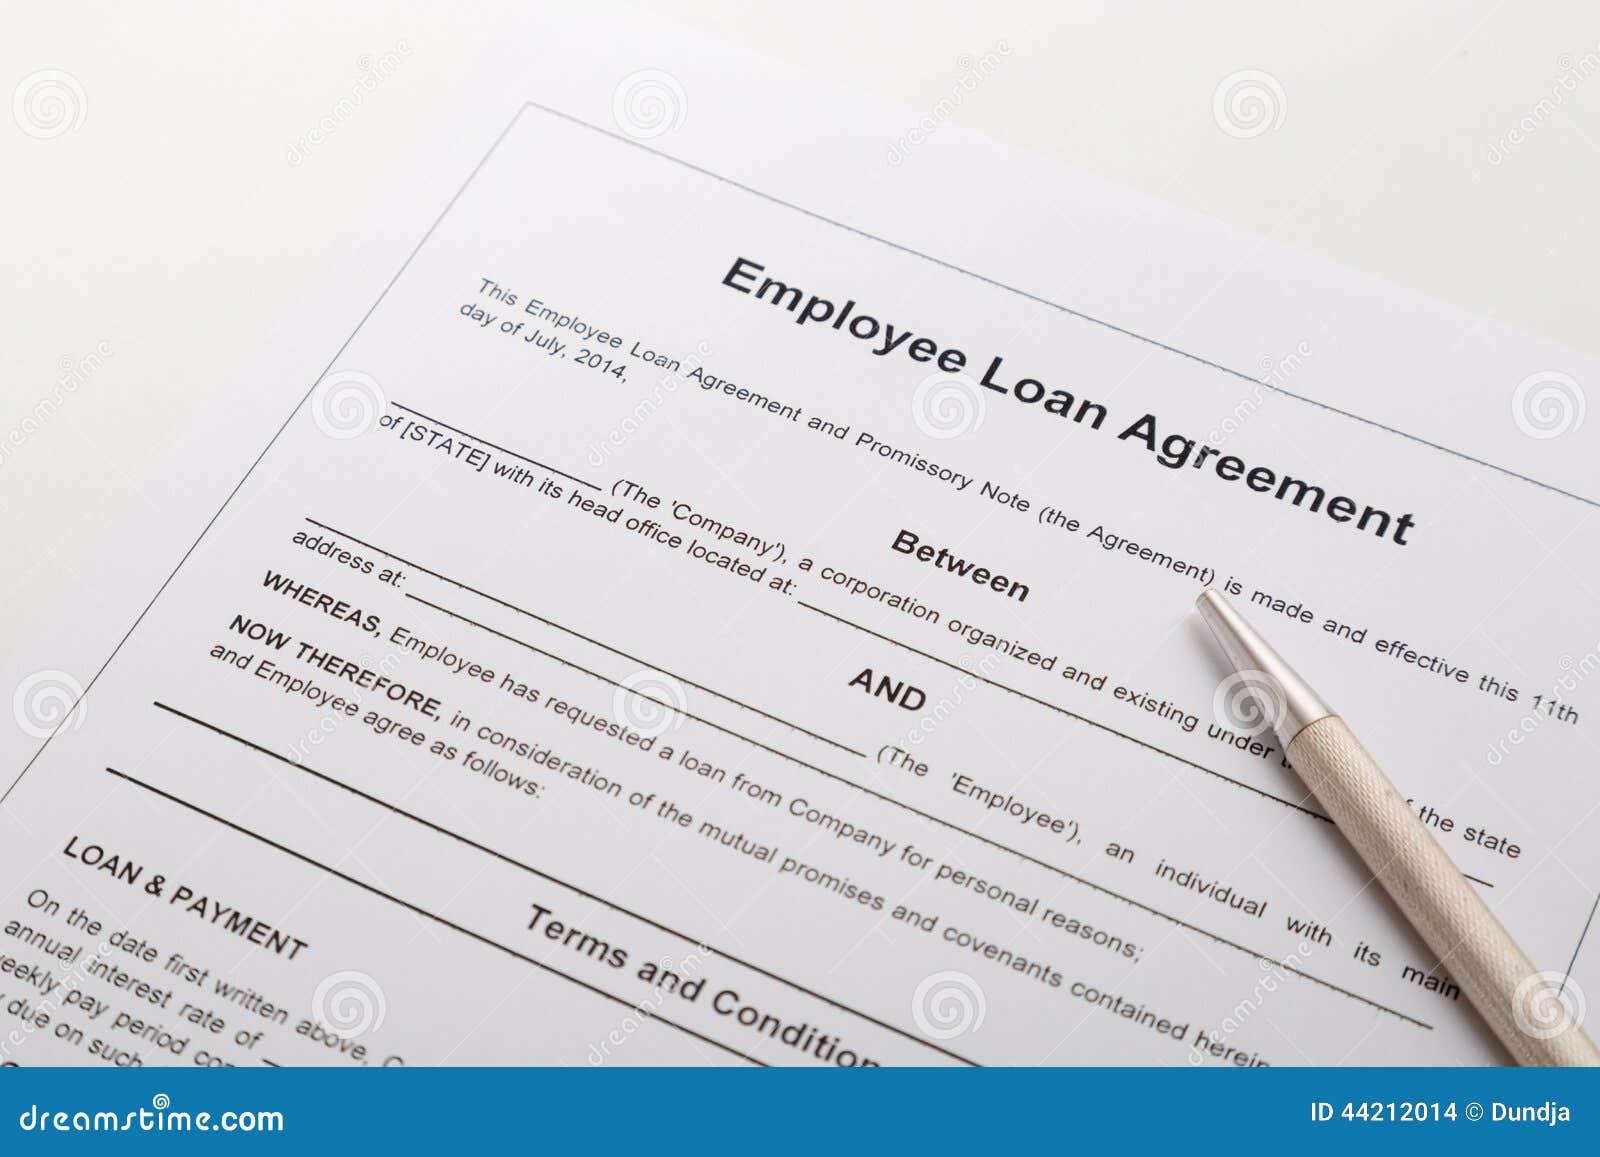 Employee Loan Agreement Stock Photo Image Of Application 44212014